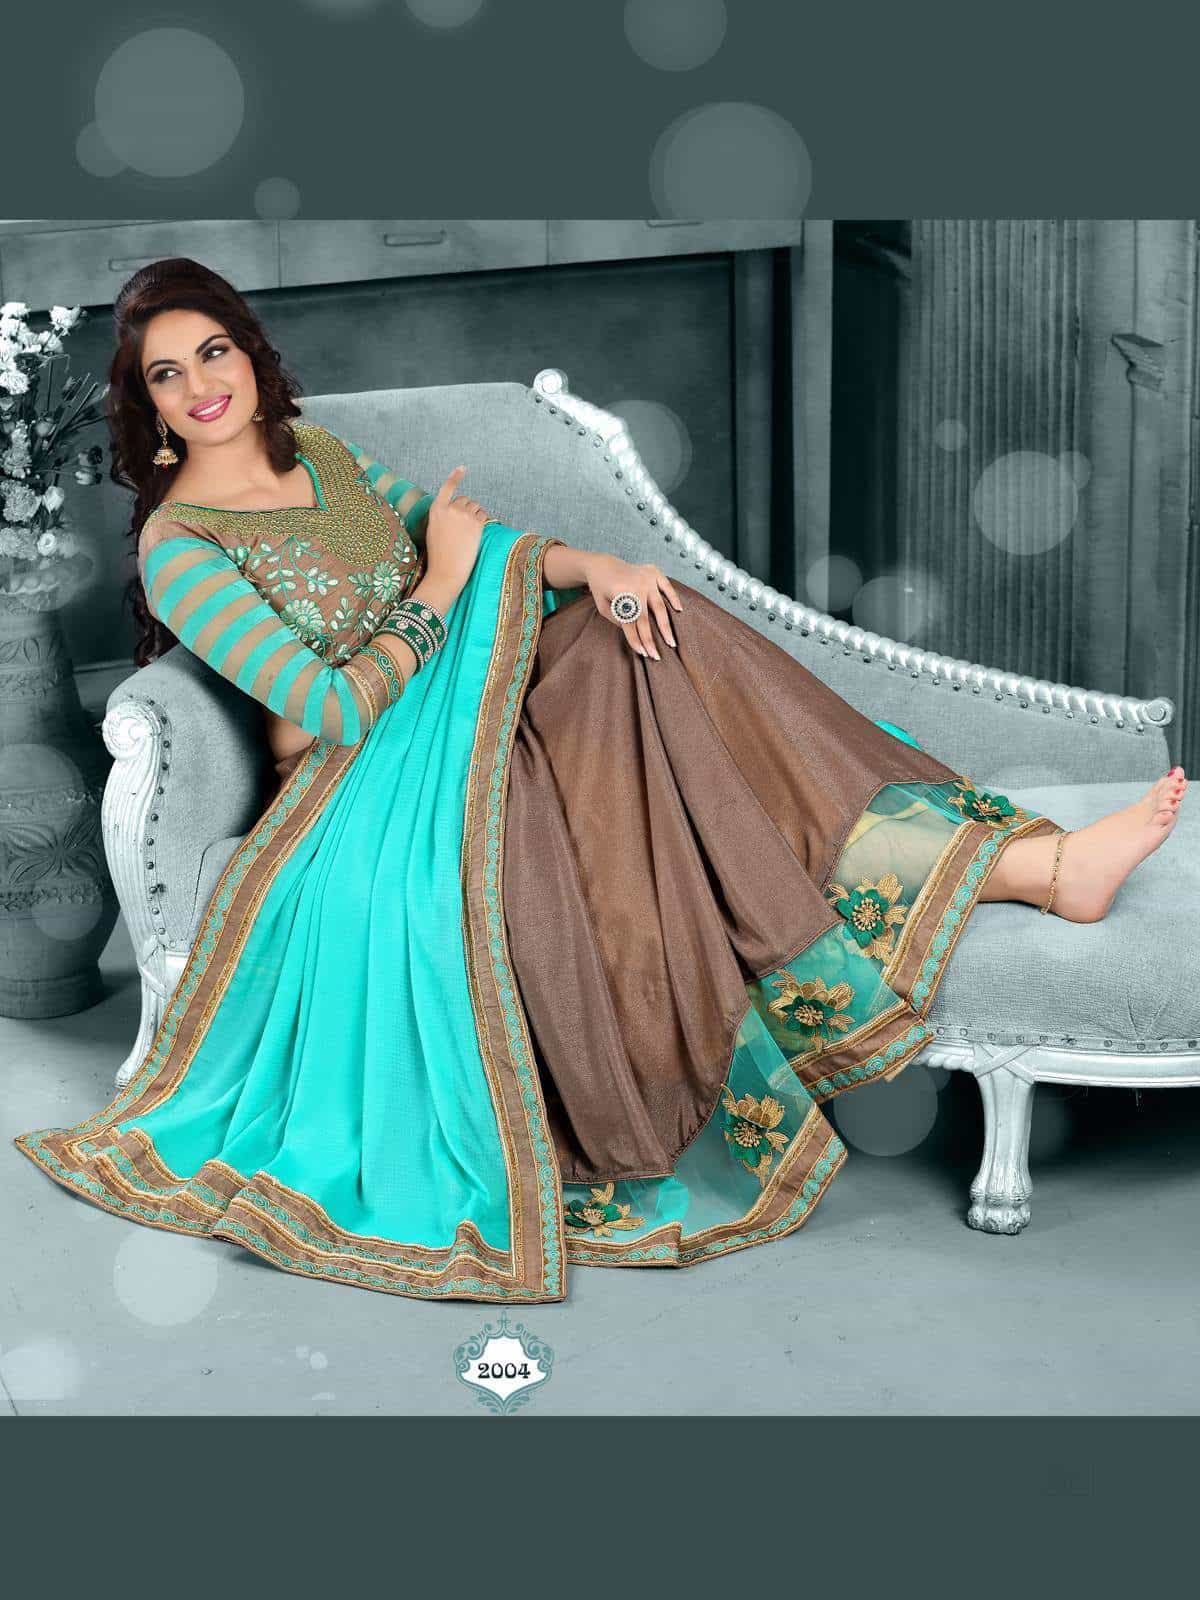 2590a1516e ... Umbrella Suit - Laaduba Sarees Photos, Punagam, Surat - Fancy Saree  Retailers · Designer Lehenga Choli ...